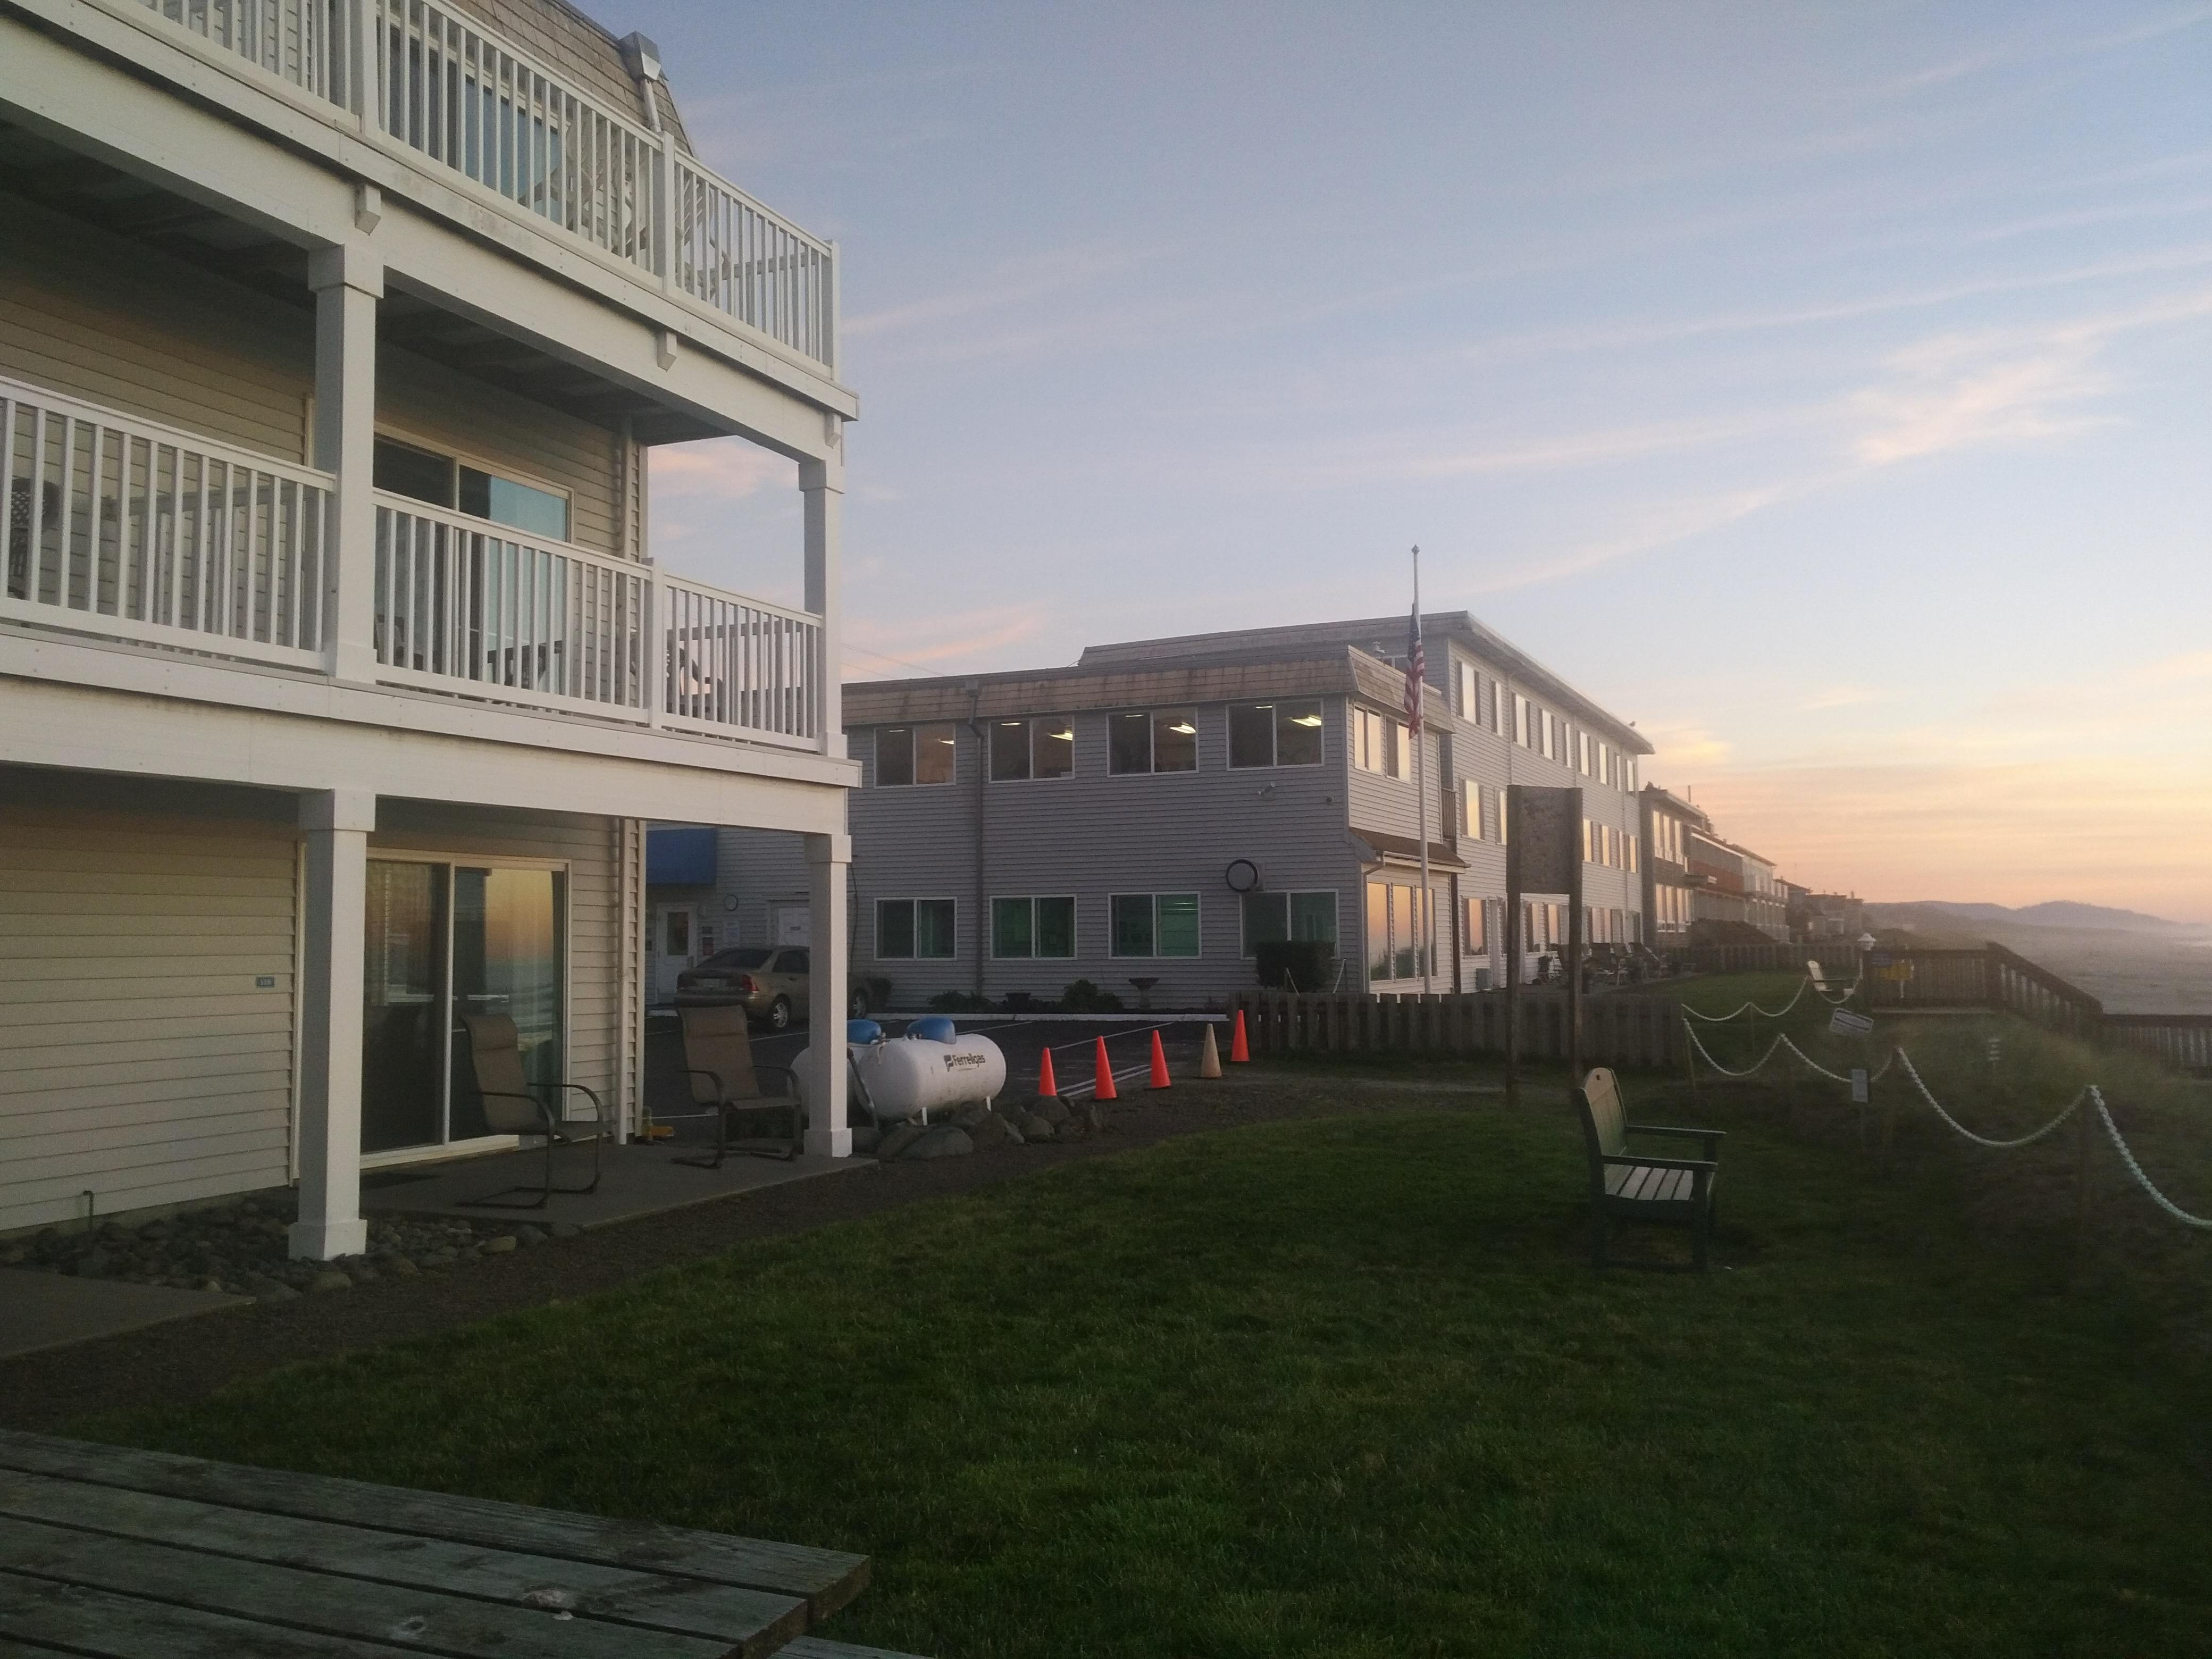 Rockaway Beach Resort image